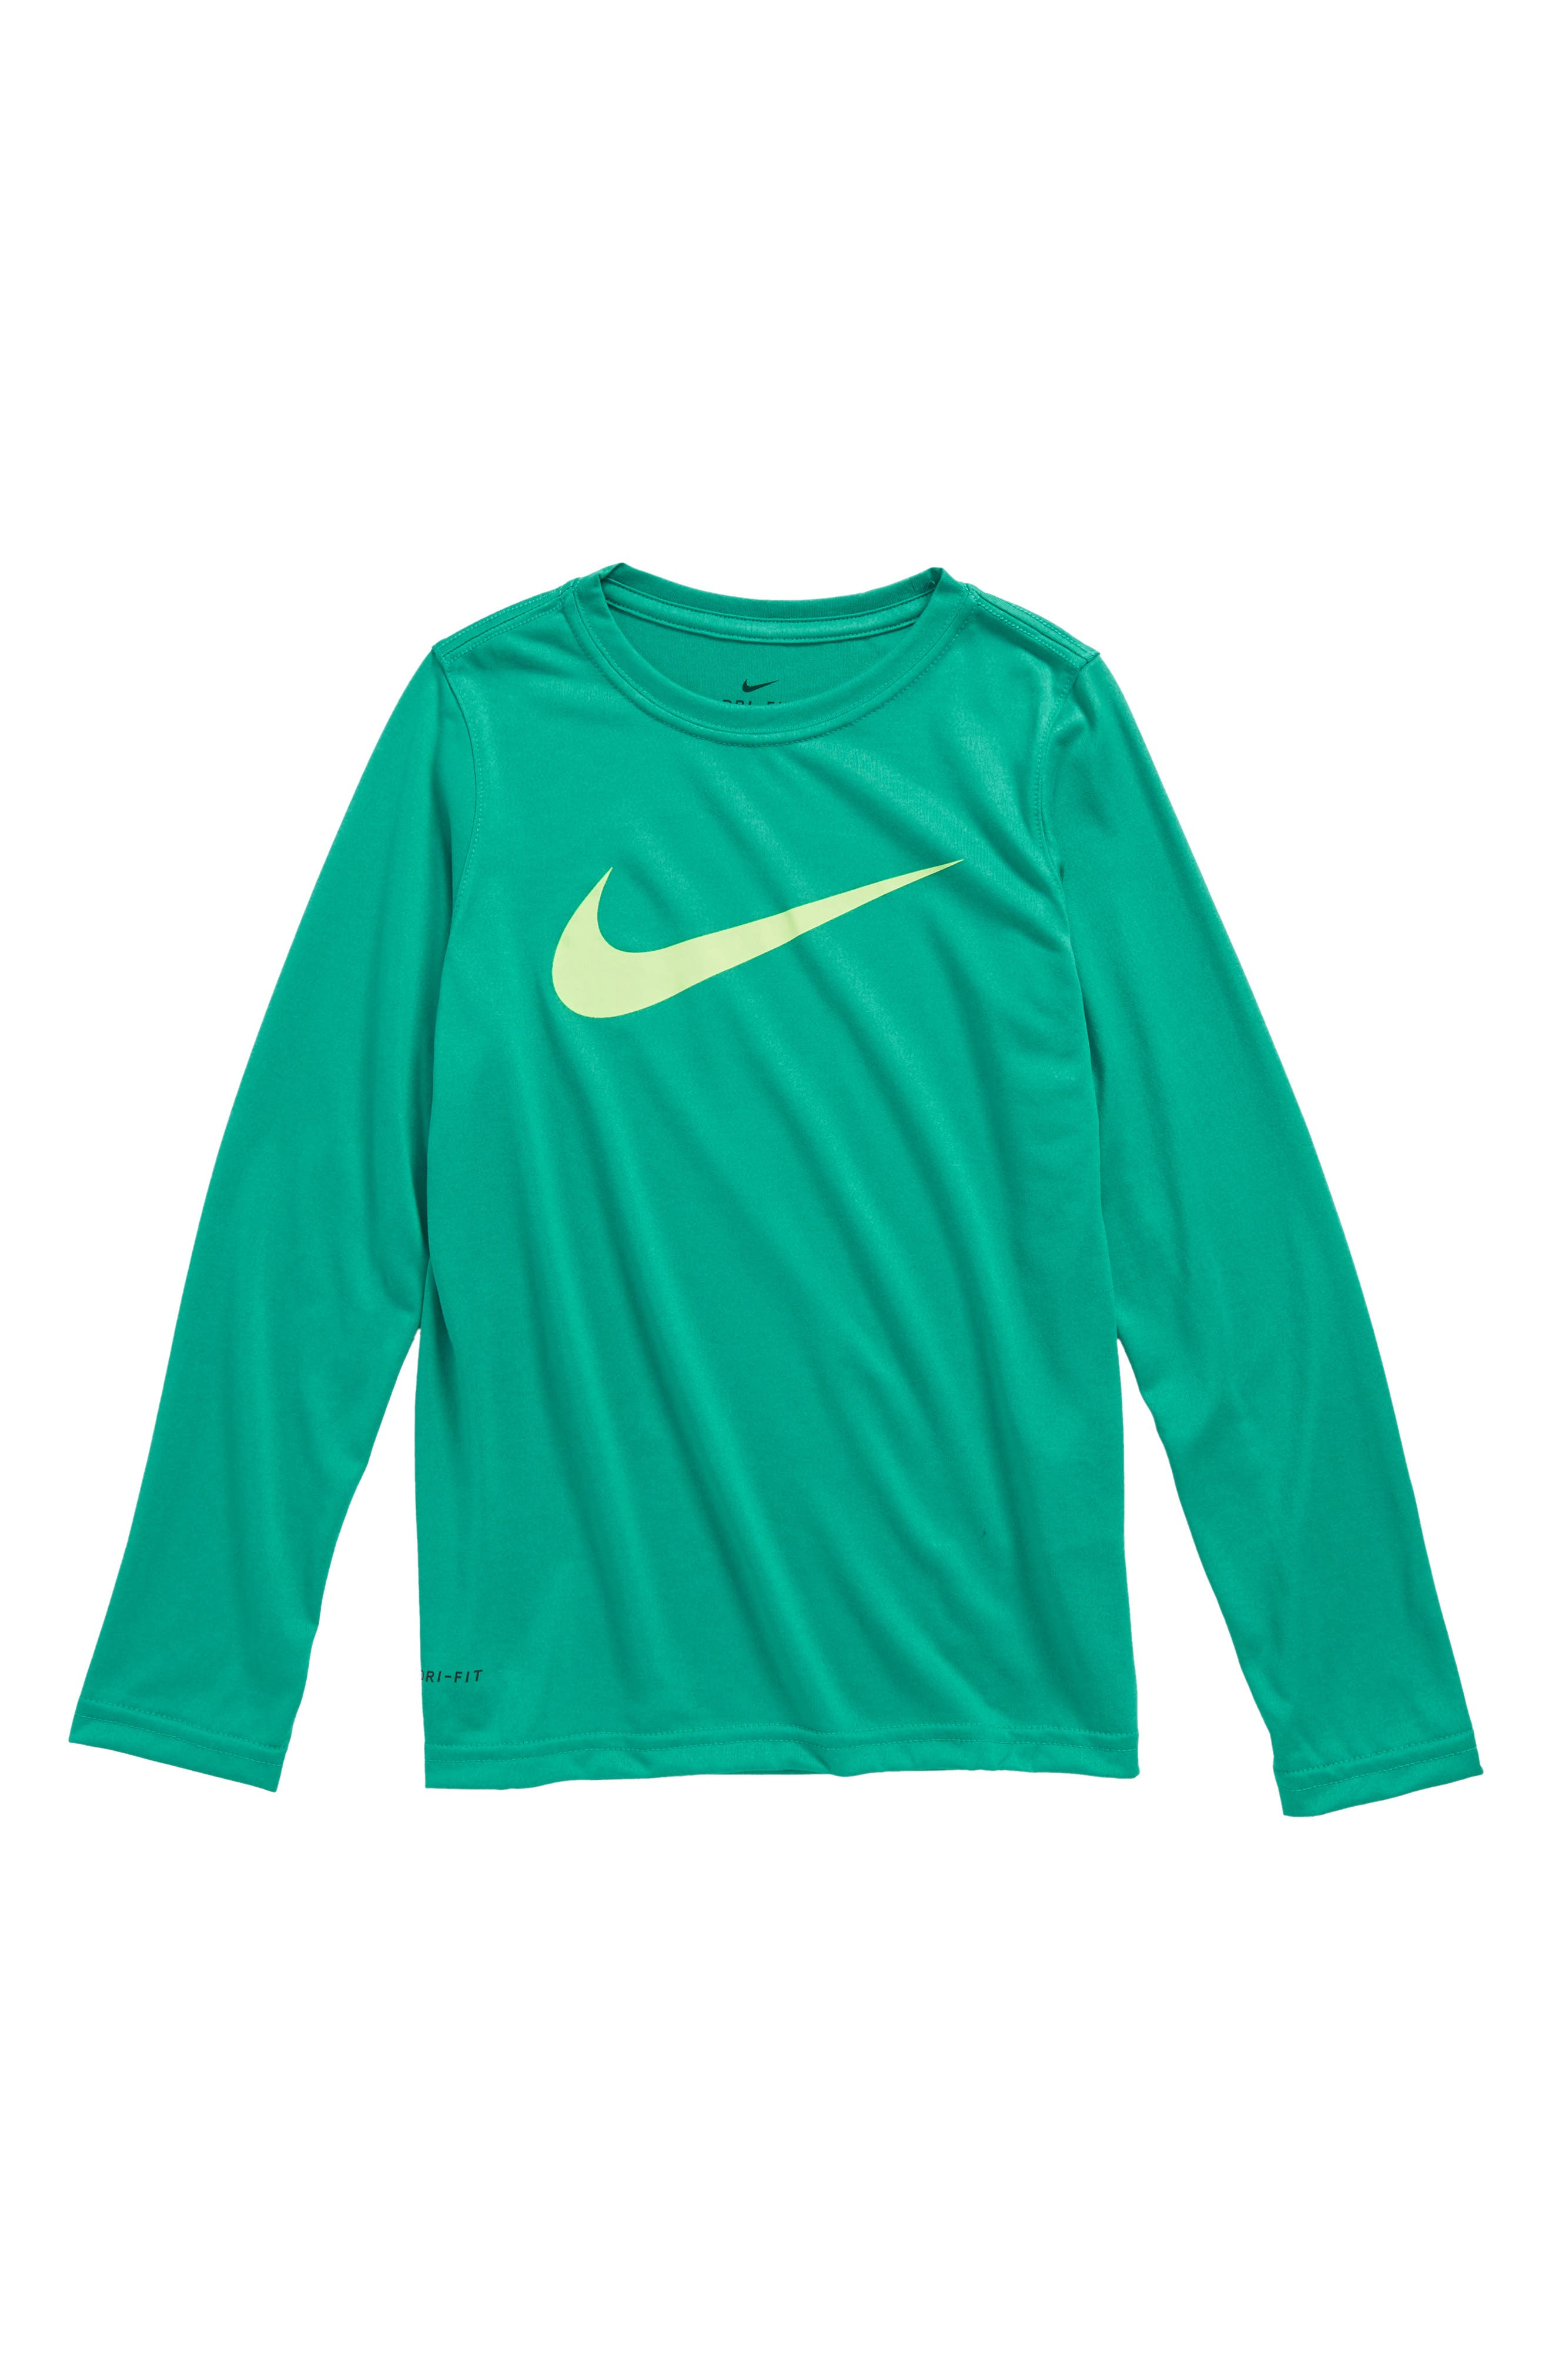 Alternate Image 1 Selected - Nike Dry Long Sleeve Swoosh Logo T-Shirt (Little Boys & Big Boys)